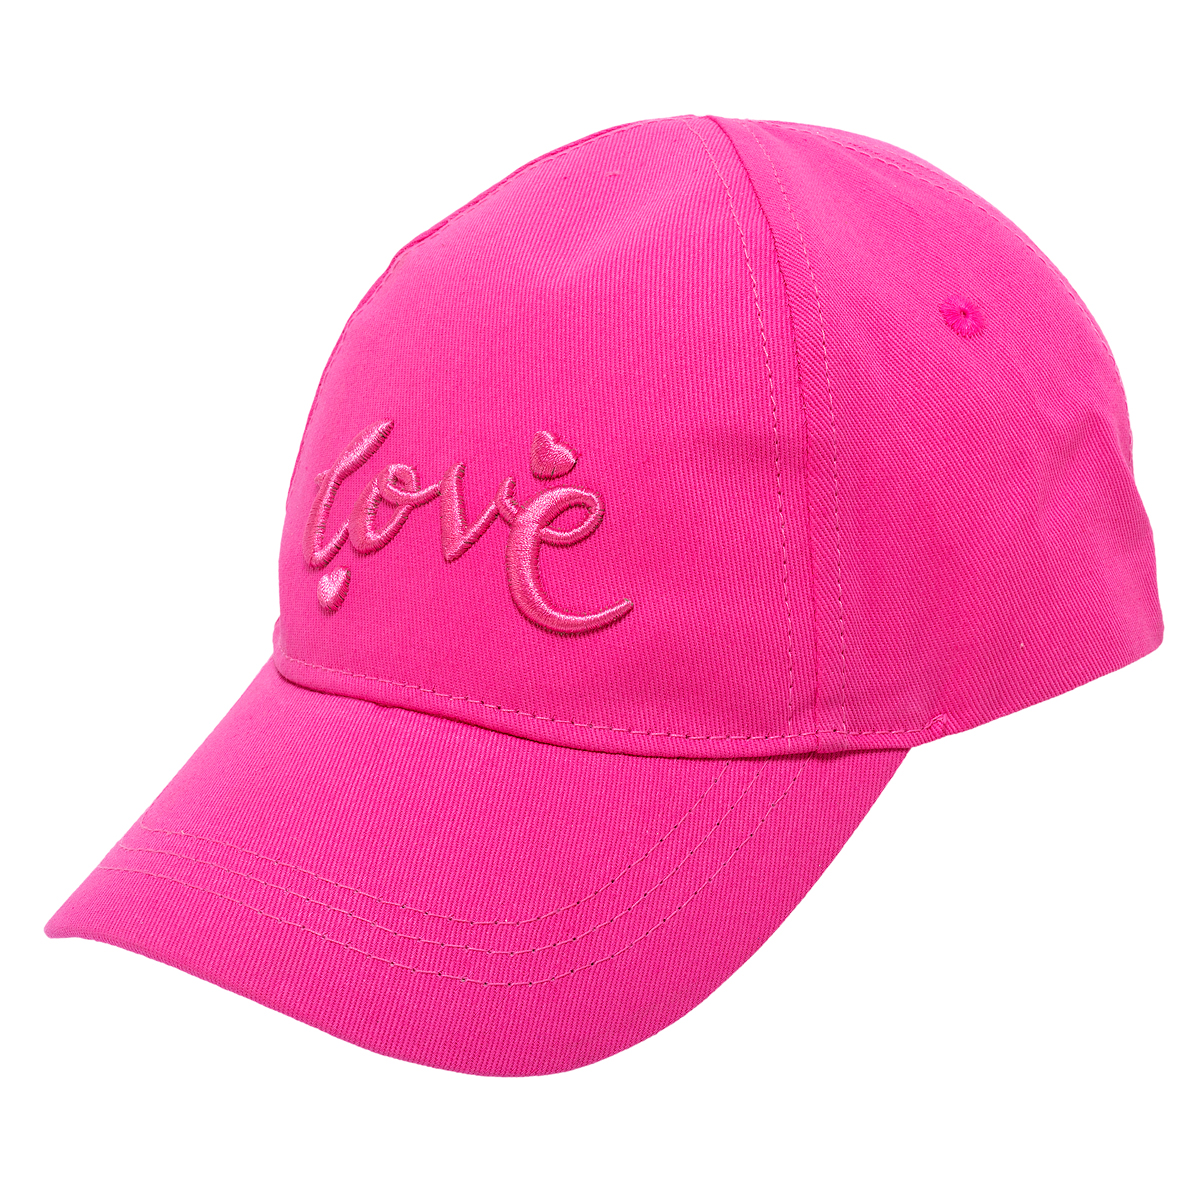 Sapca pentru copii Chicco Banya, roz, 04499